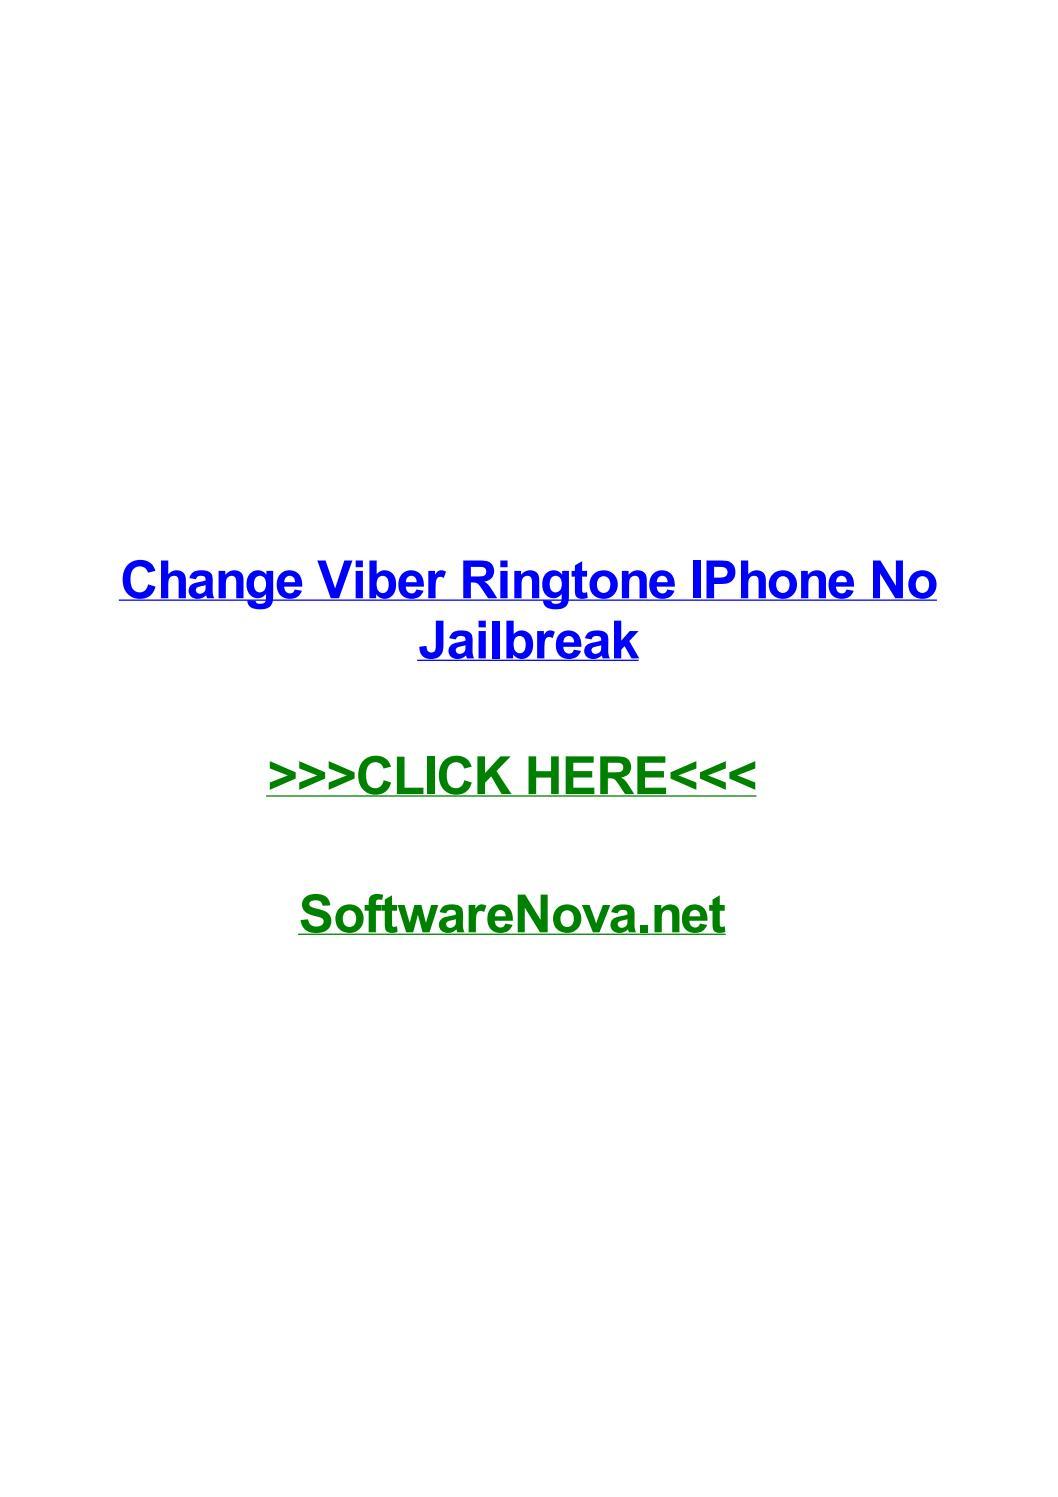 Change viber ringtone iphone no jailbreak by lauralehv - Issuu